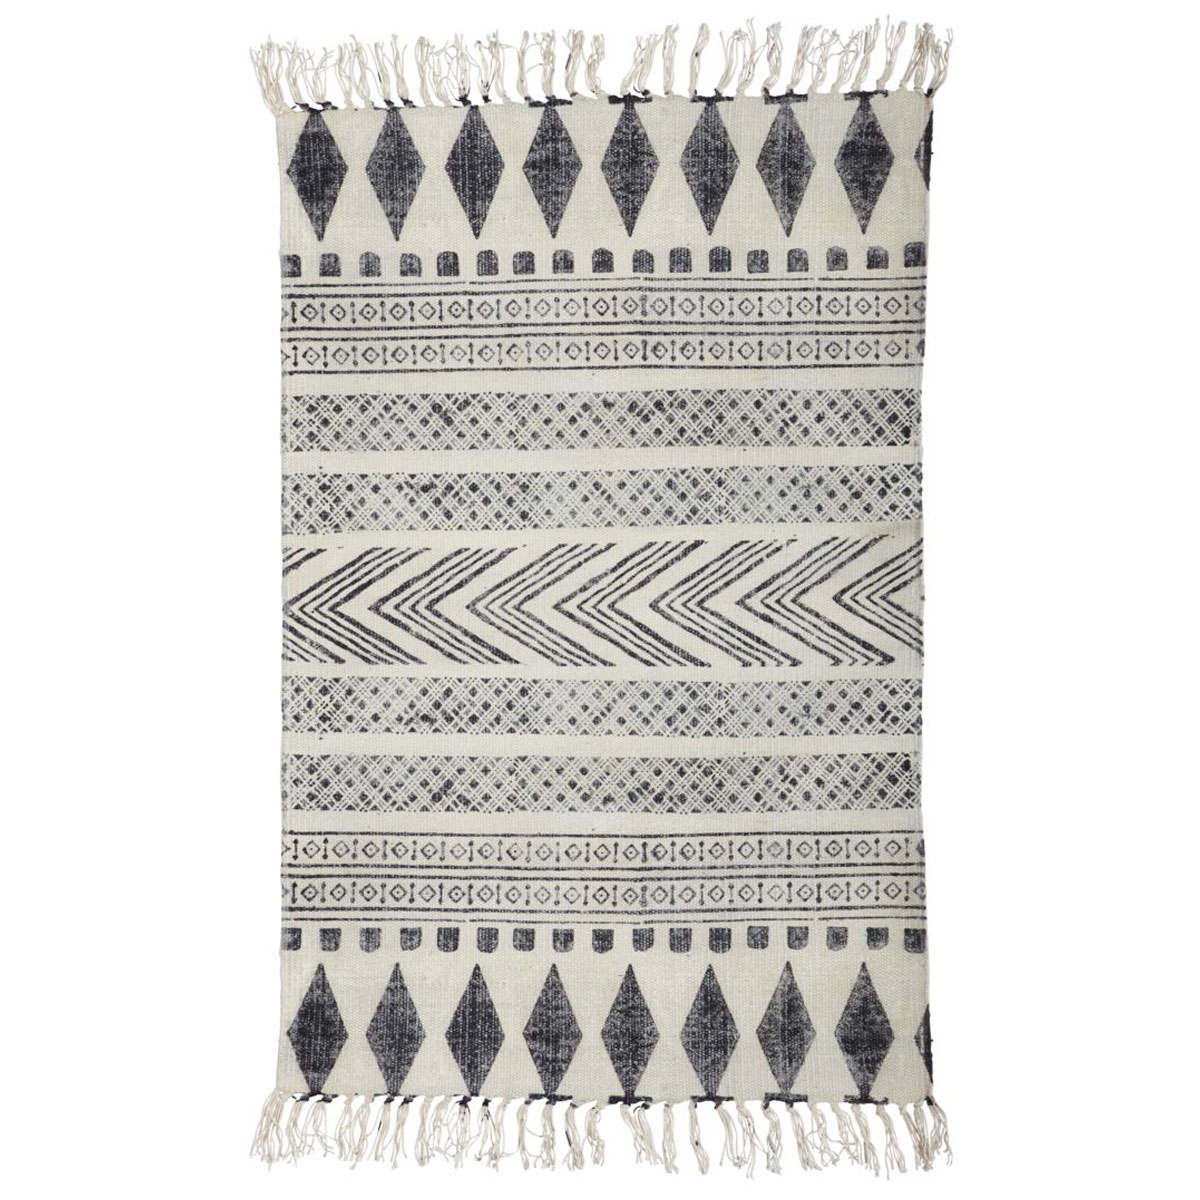 Tapete Block, c/franjas, algodão, 160x230 cm